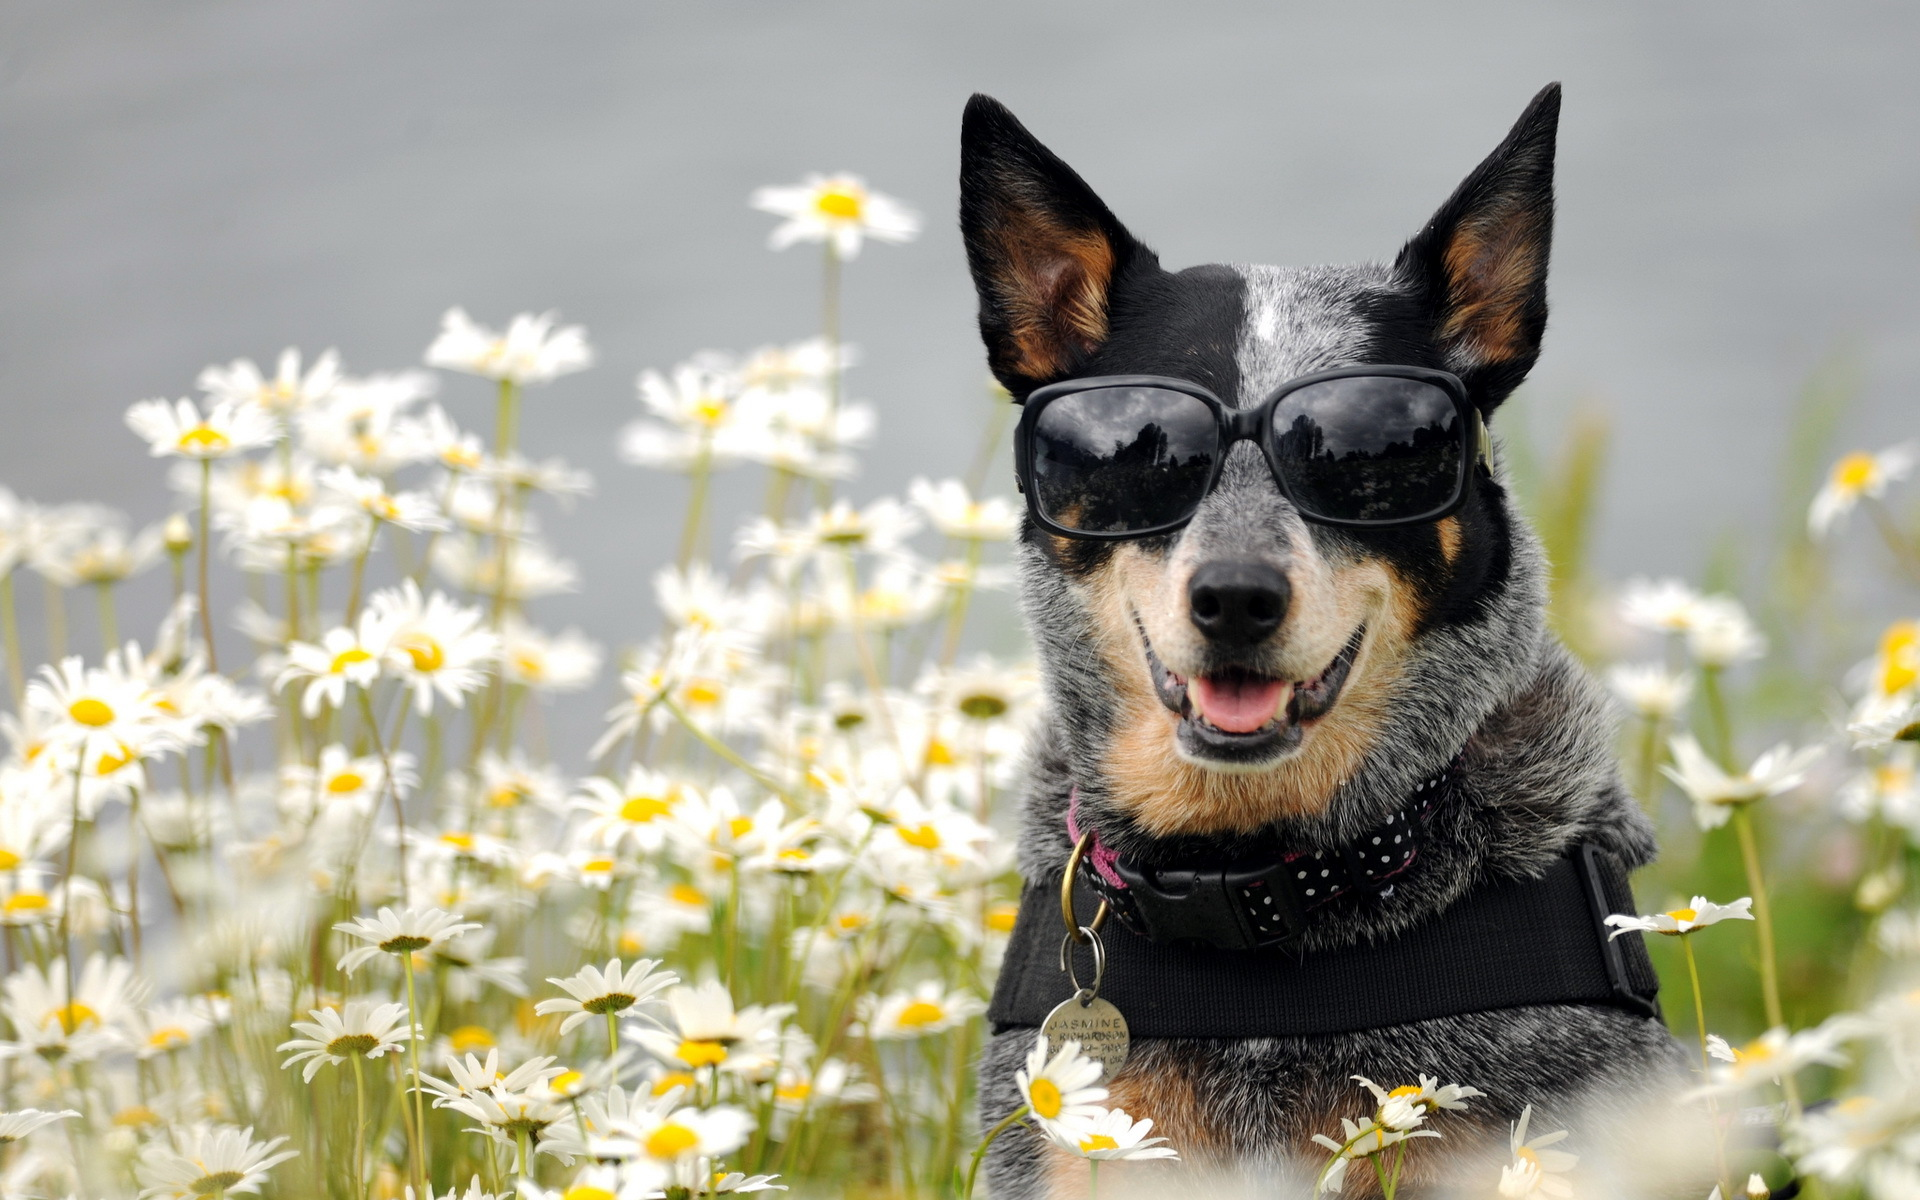 Daisy Dog Flower Sunglasses 1920x1200